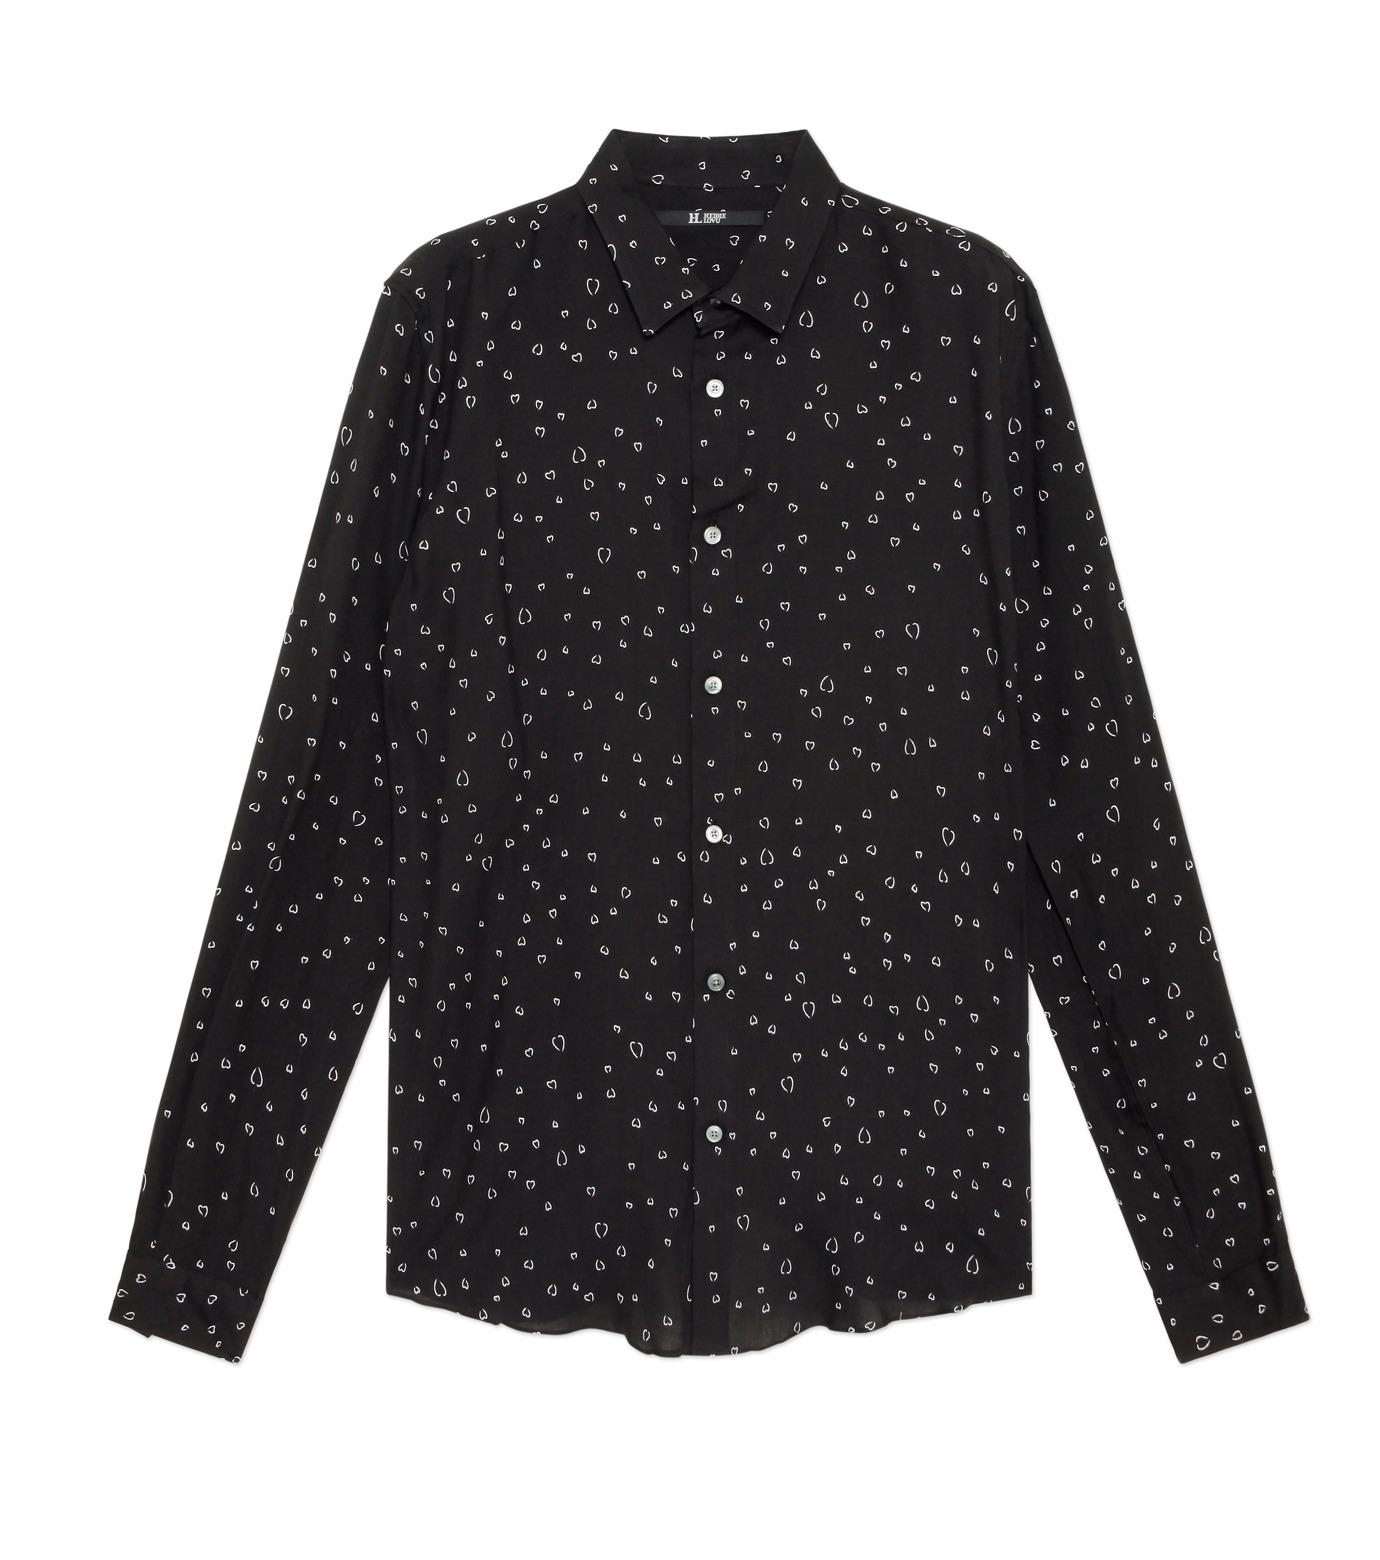 HL HEDDIE LOVU(エイチエル・エディールーヴ)のLINE HEART PATTERN SHIRT-BLACK(シャツ/shirt)-18S93002-13 拡大詳細画像1